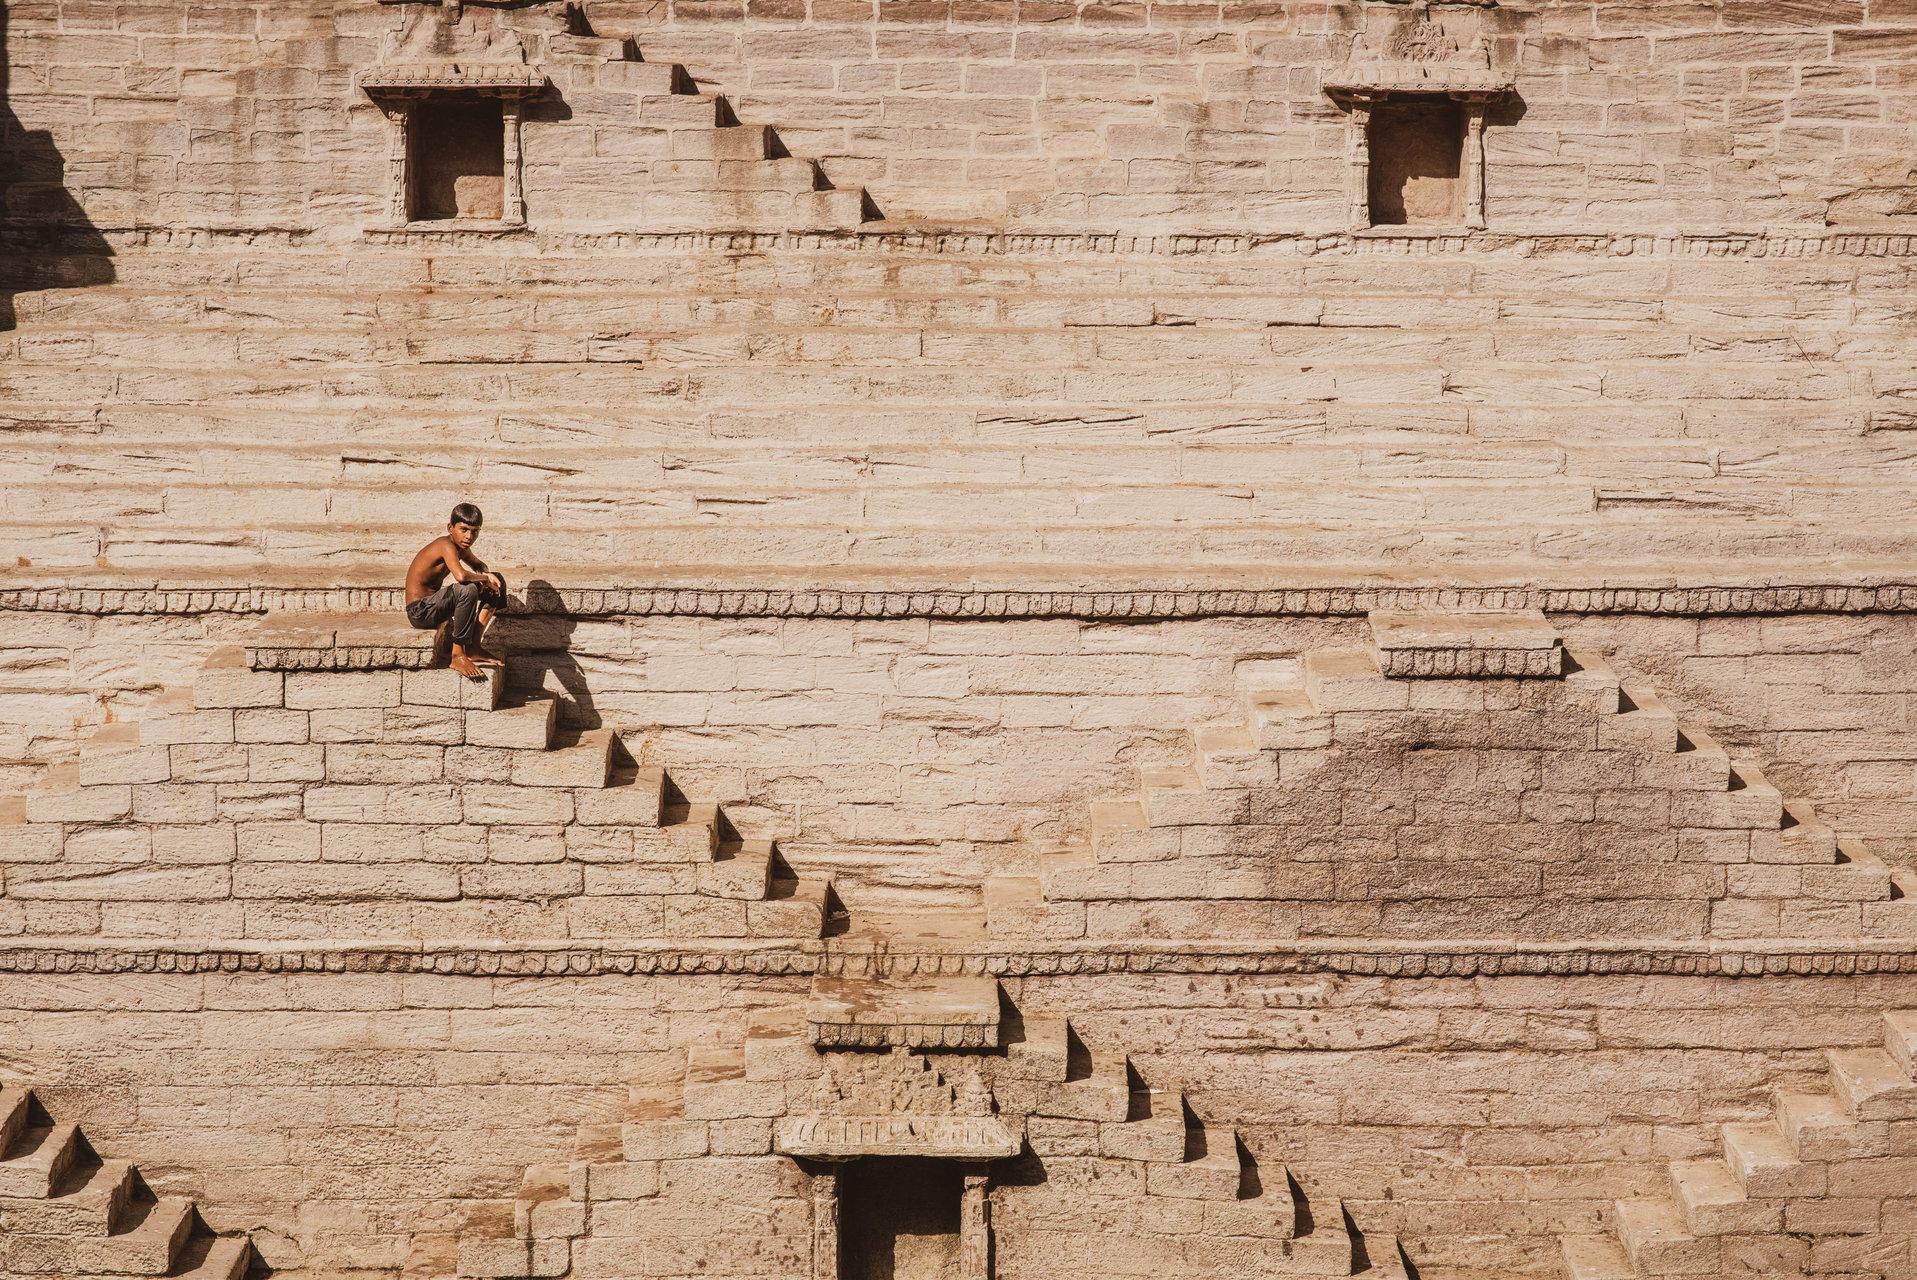 step well in Jaipur, India | Author Emil  - Silenteyes | PHOTO FORUM